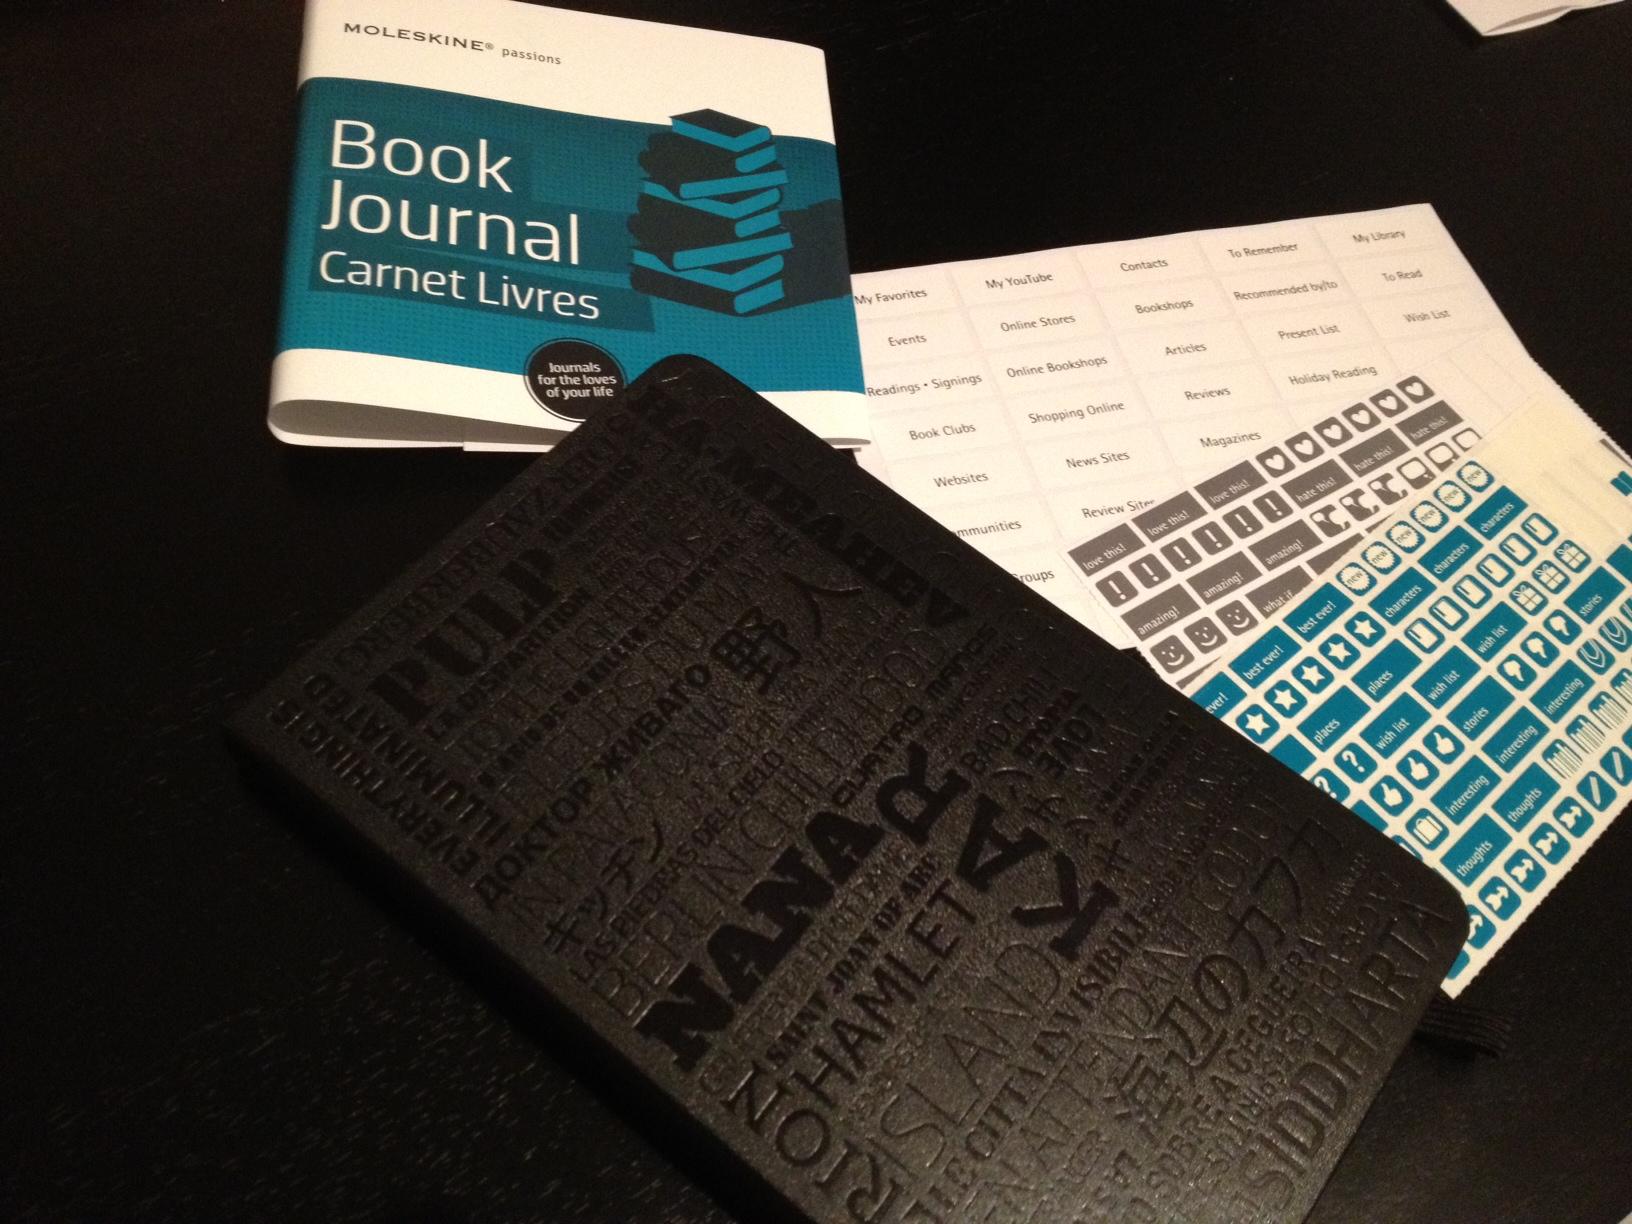 Moleskin Book Journal -  Savannah Page, author